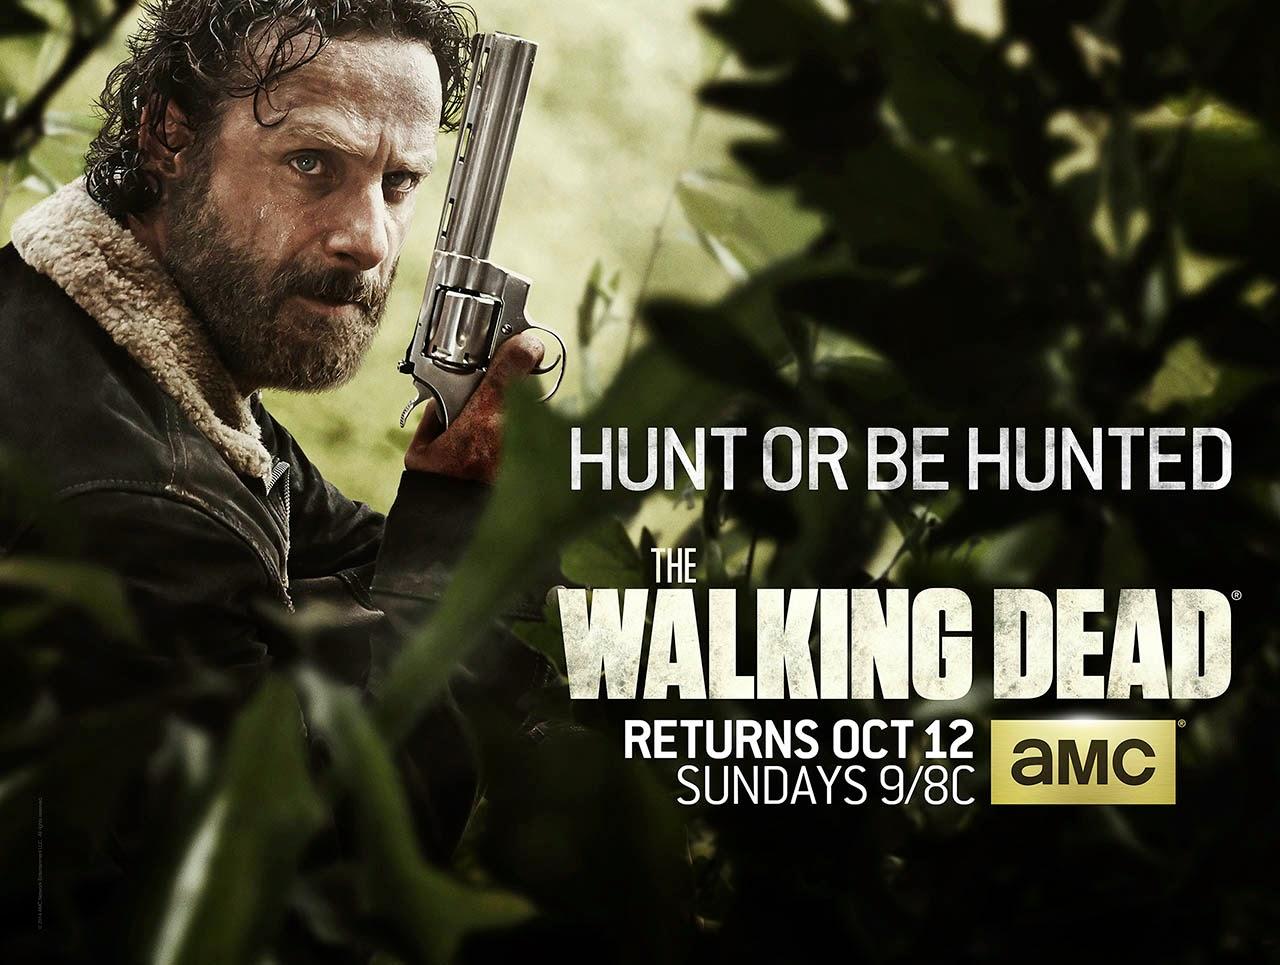 Ver The Walking Dead 5x02